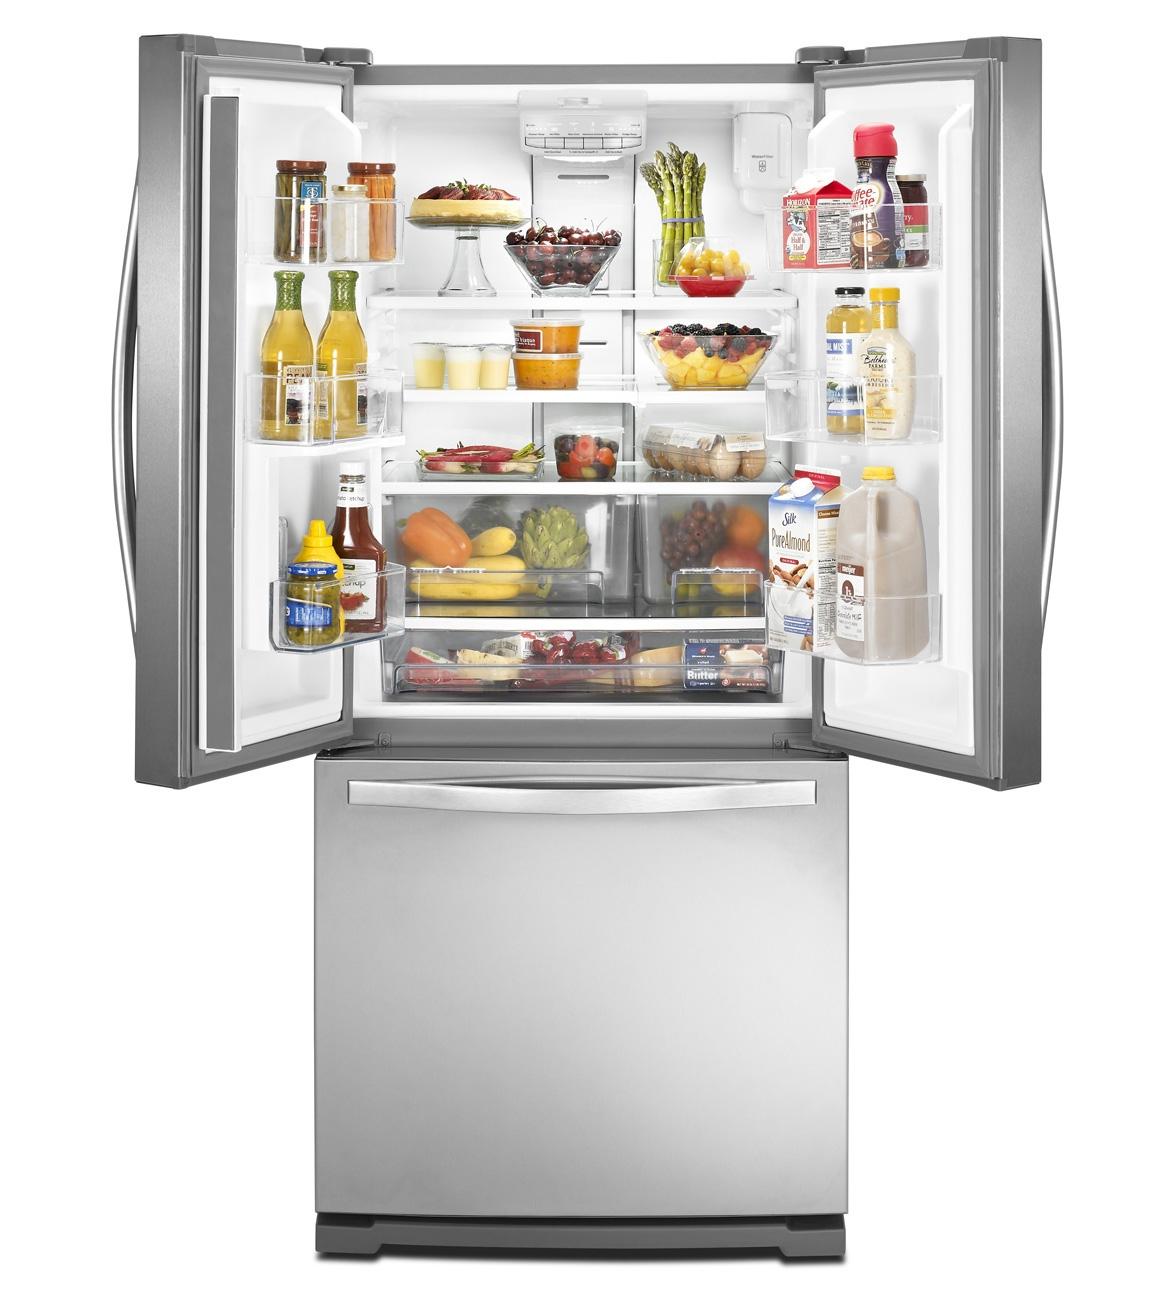 Whirlpool white ice refrigerator counter depth - Main Image Interior